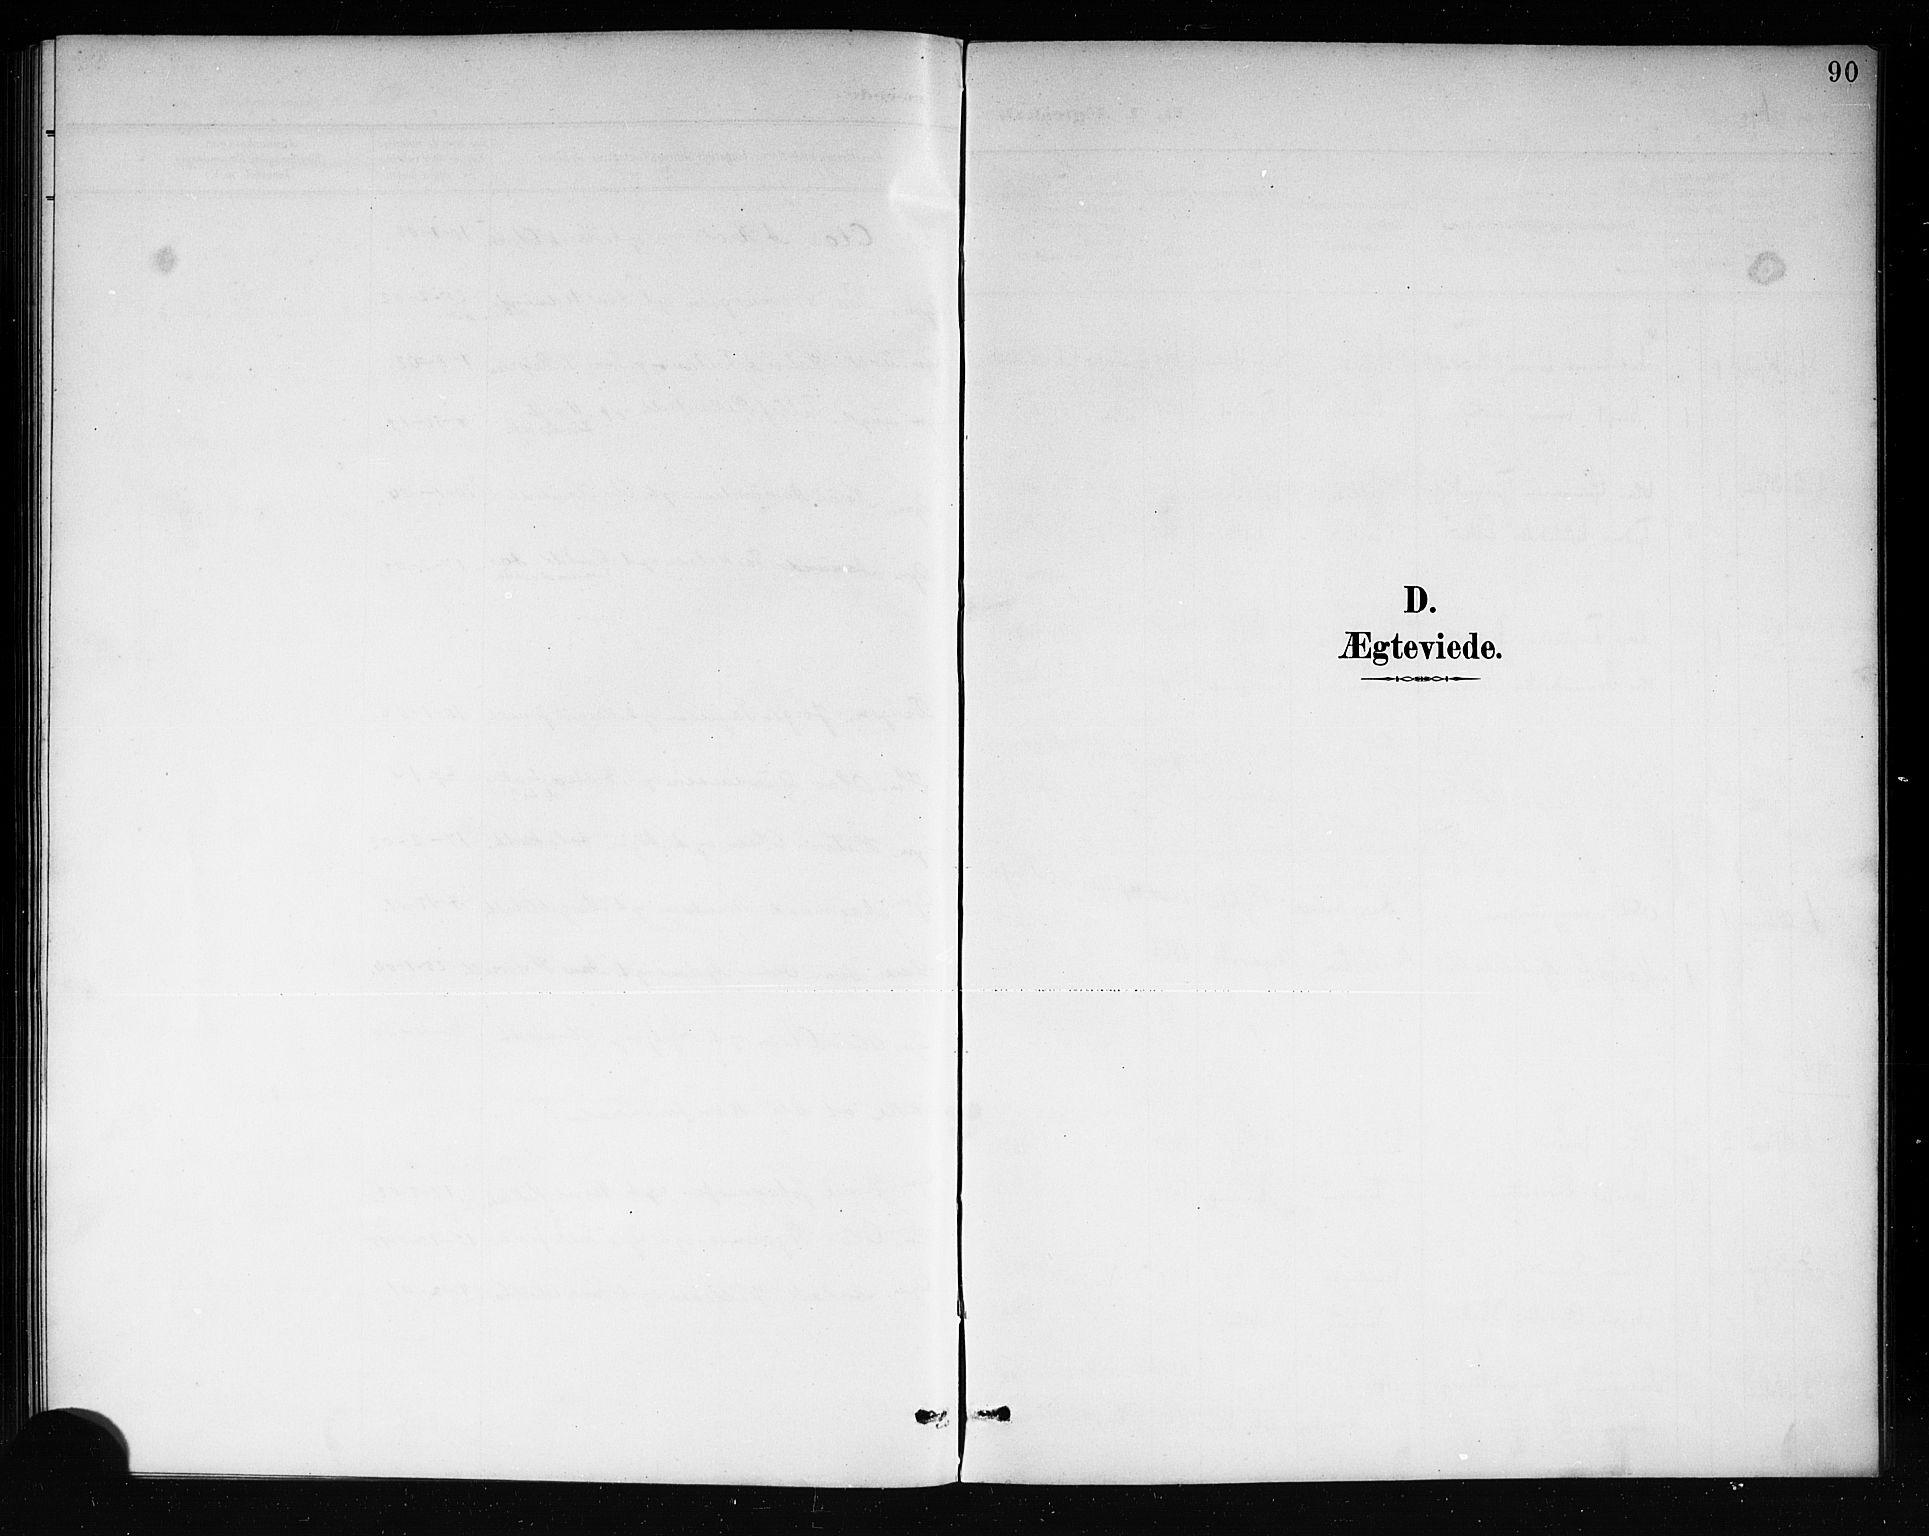 SAKO, Mo kirkebøker, G/Ga/L0002: Klokkerbok nr. I 2, 1892-1914, s. 90